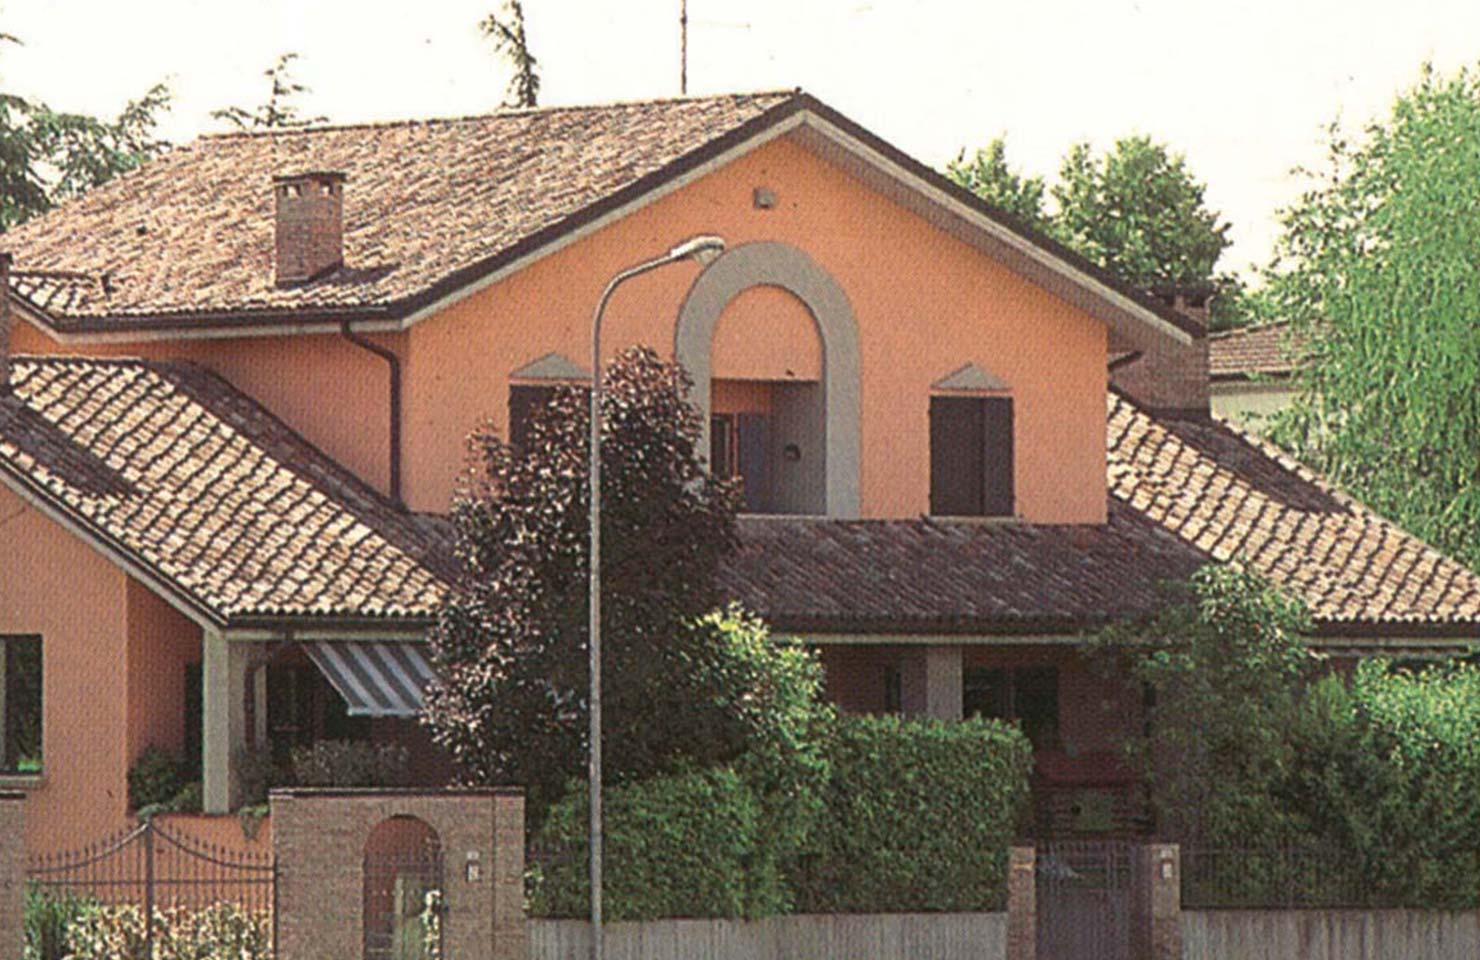 Ville singole – Reggio Emilia